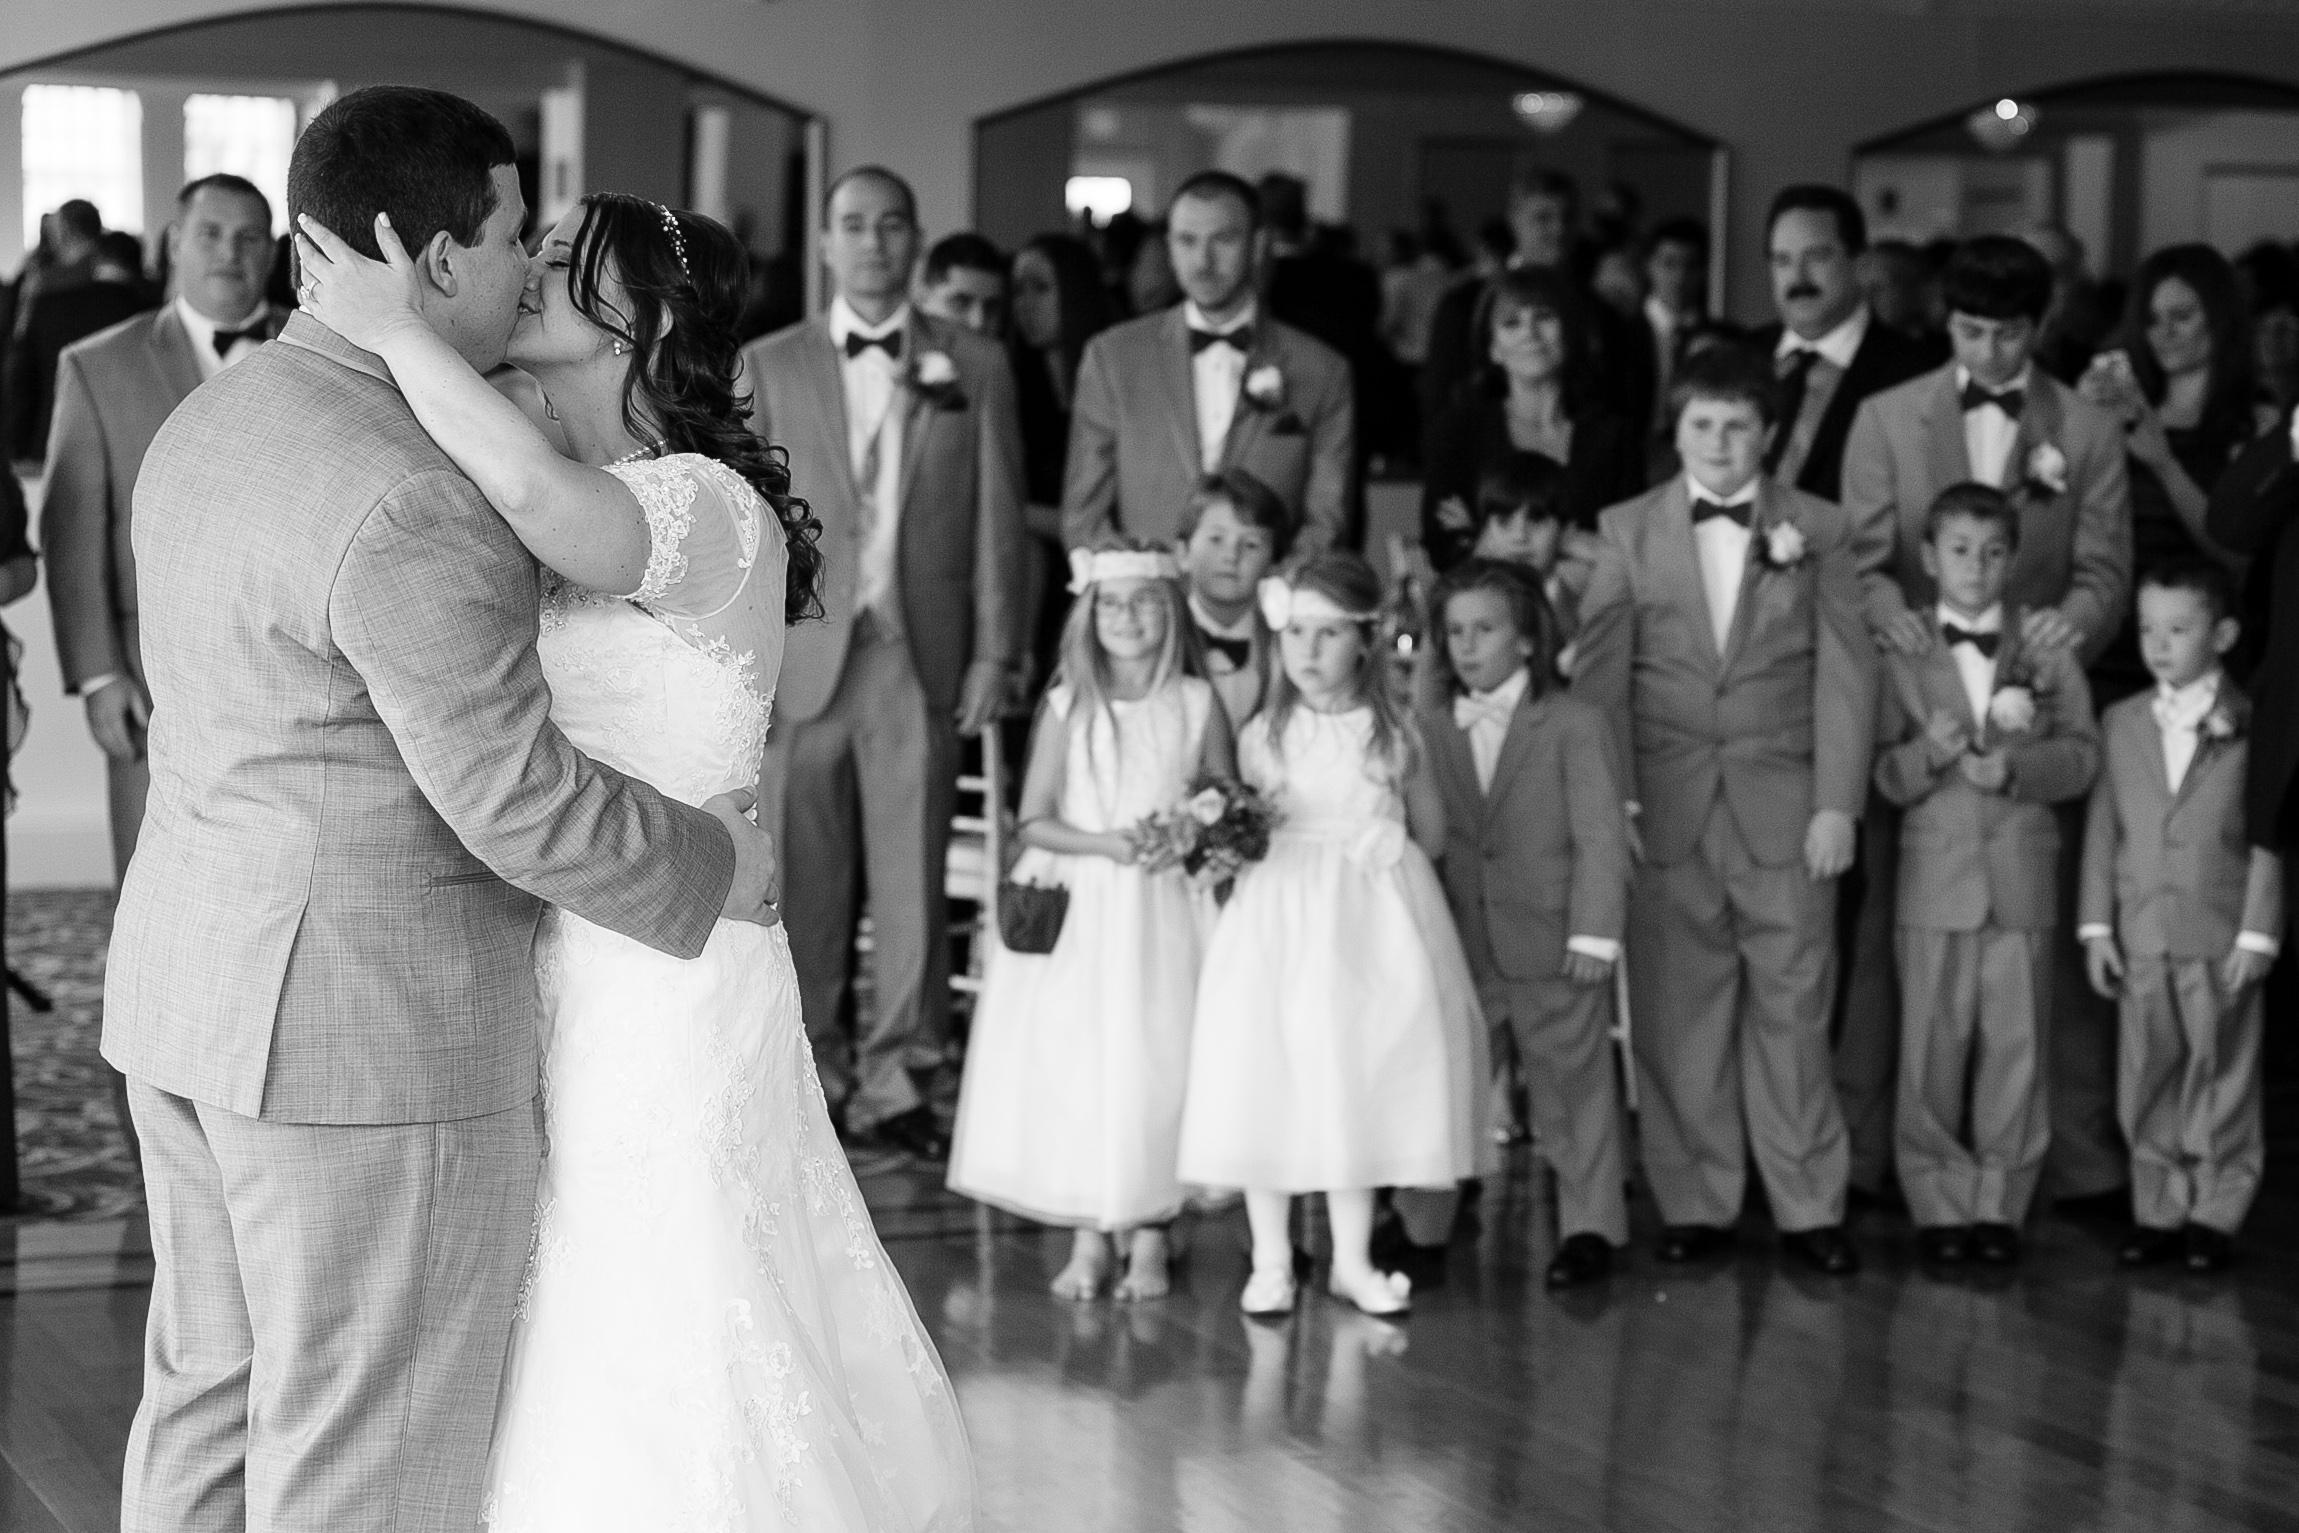 Connecticut-Fall-Wedding-Candlewood-Inn-CT-Documentary-Wedding-Photographer-Jacek-Dolata-111-11.jpg